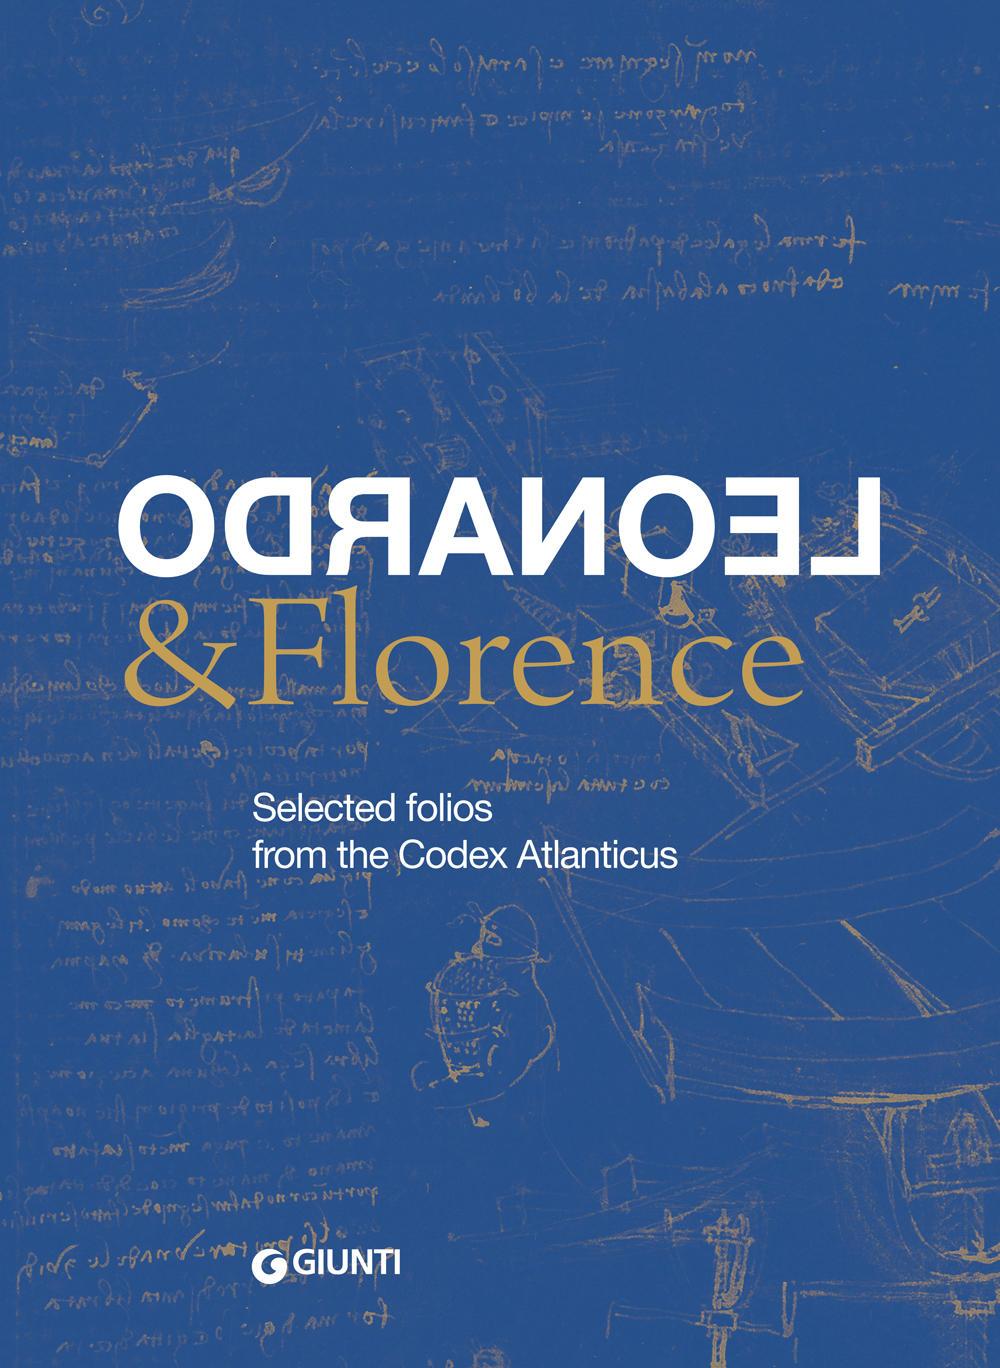 Leonardo & Florence